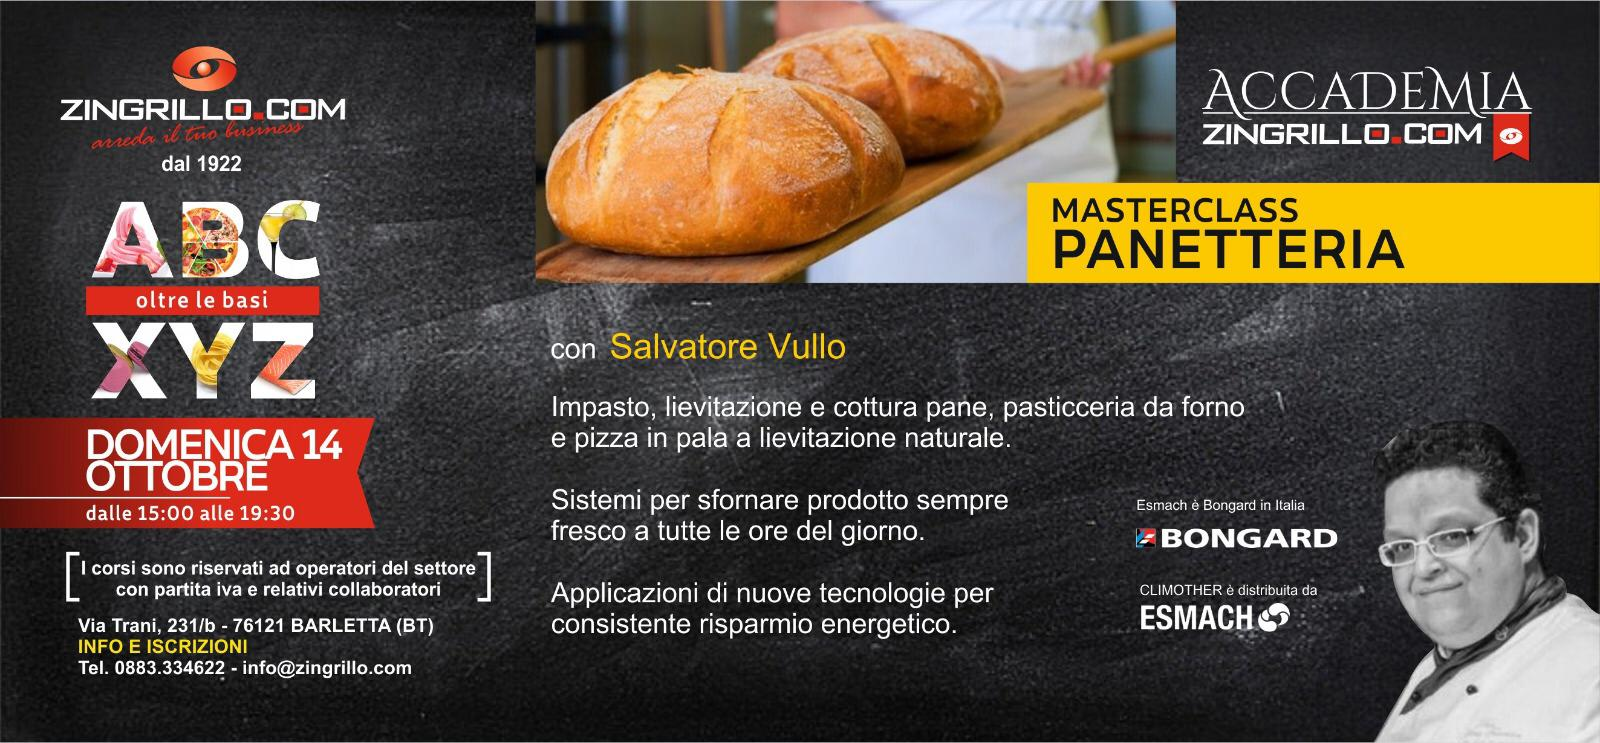 masterclass_panetteria_14-10-18